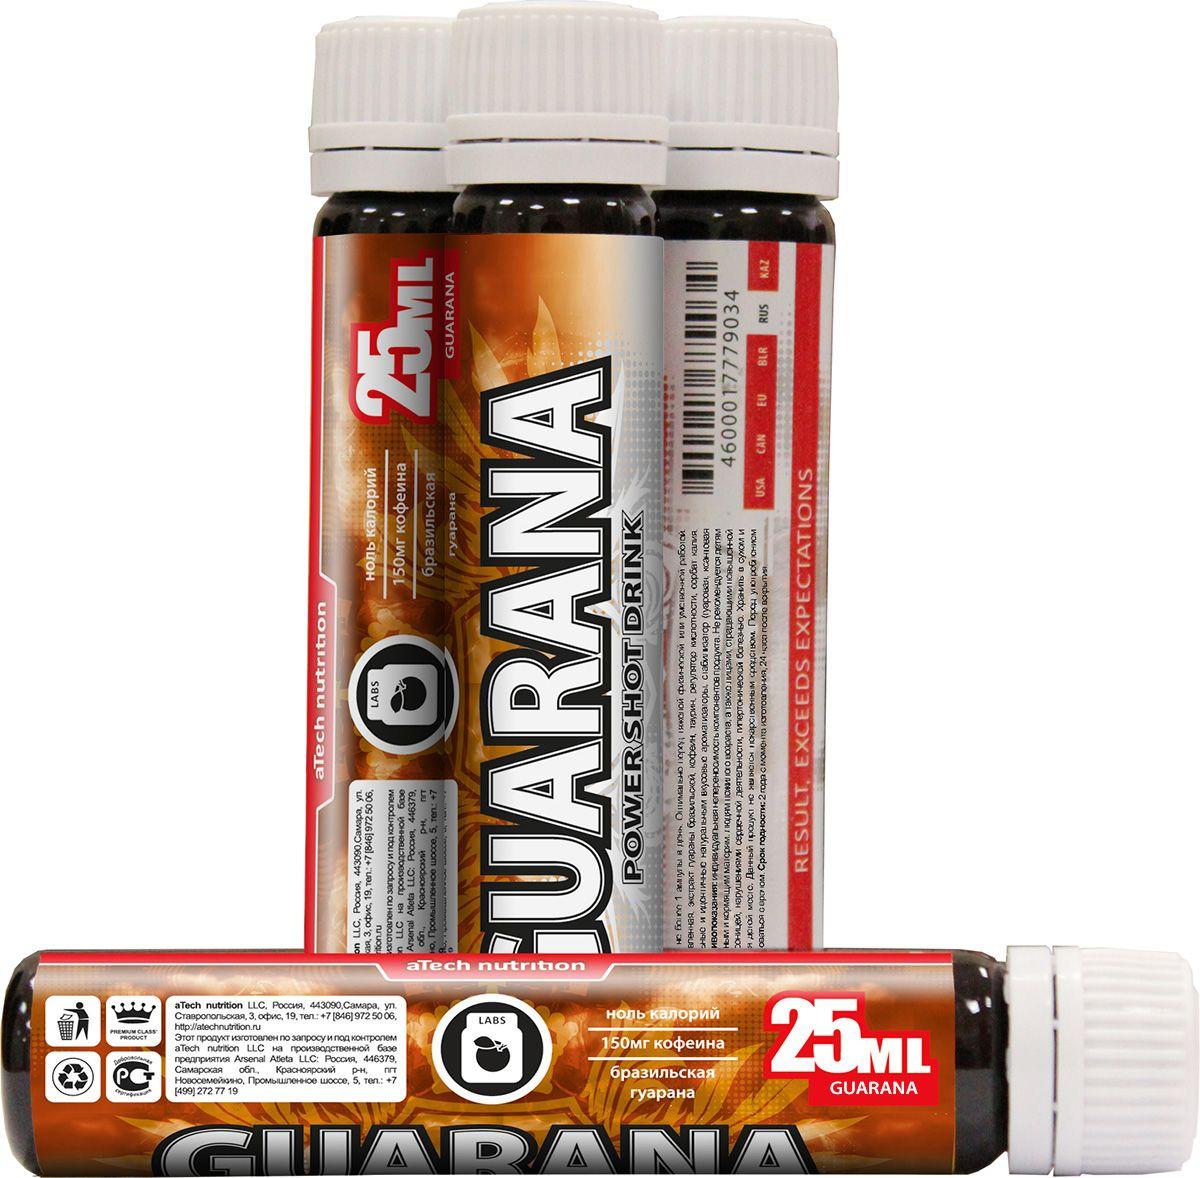 Энергетический напиток aTech Nutrition Guarana Power Shot Drink, гуарана, 25 мл пищевая добавка atech nutrition glucosamine chondroitine mcm 100 капсул